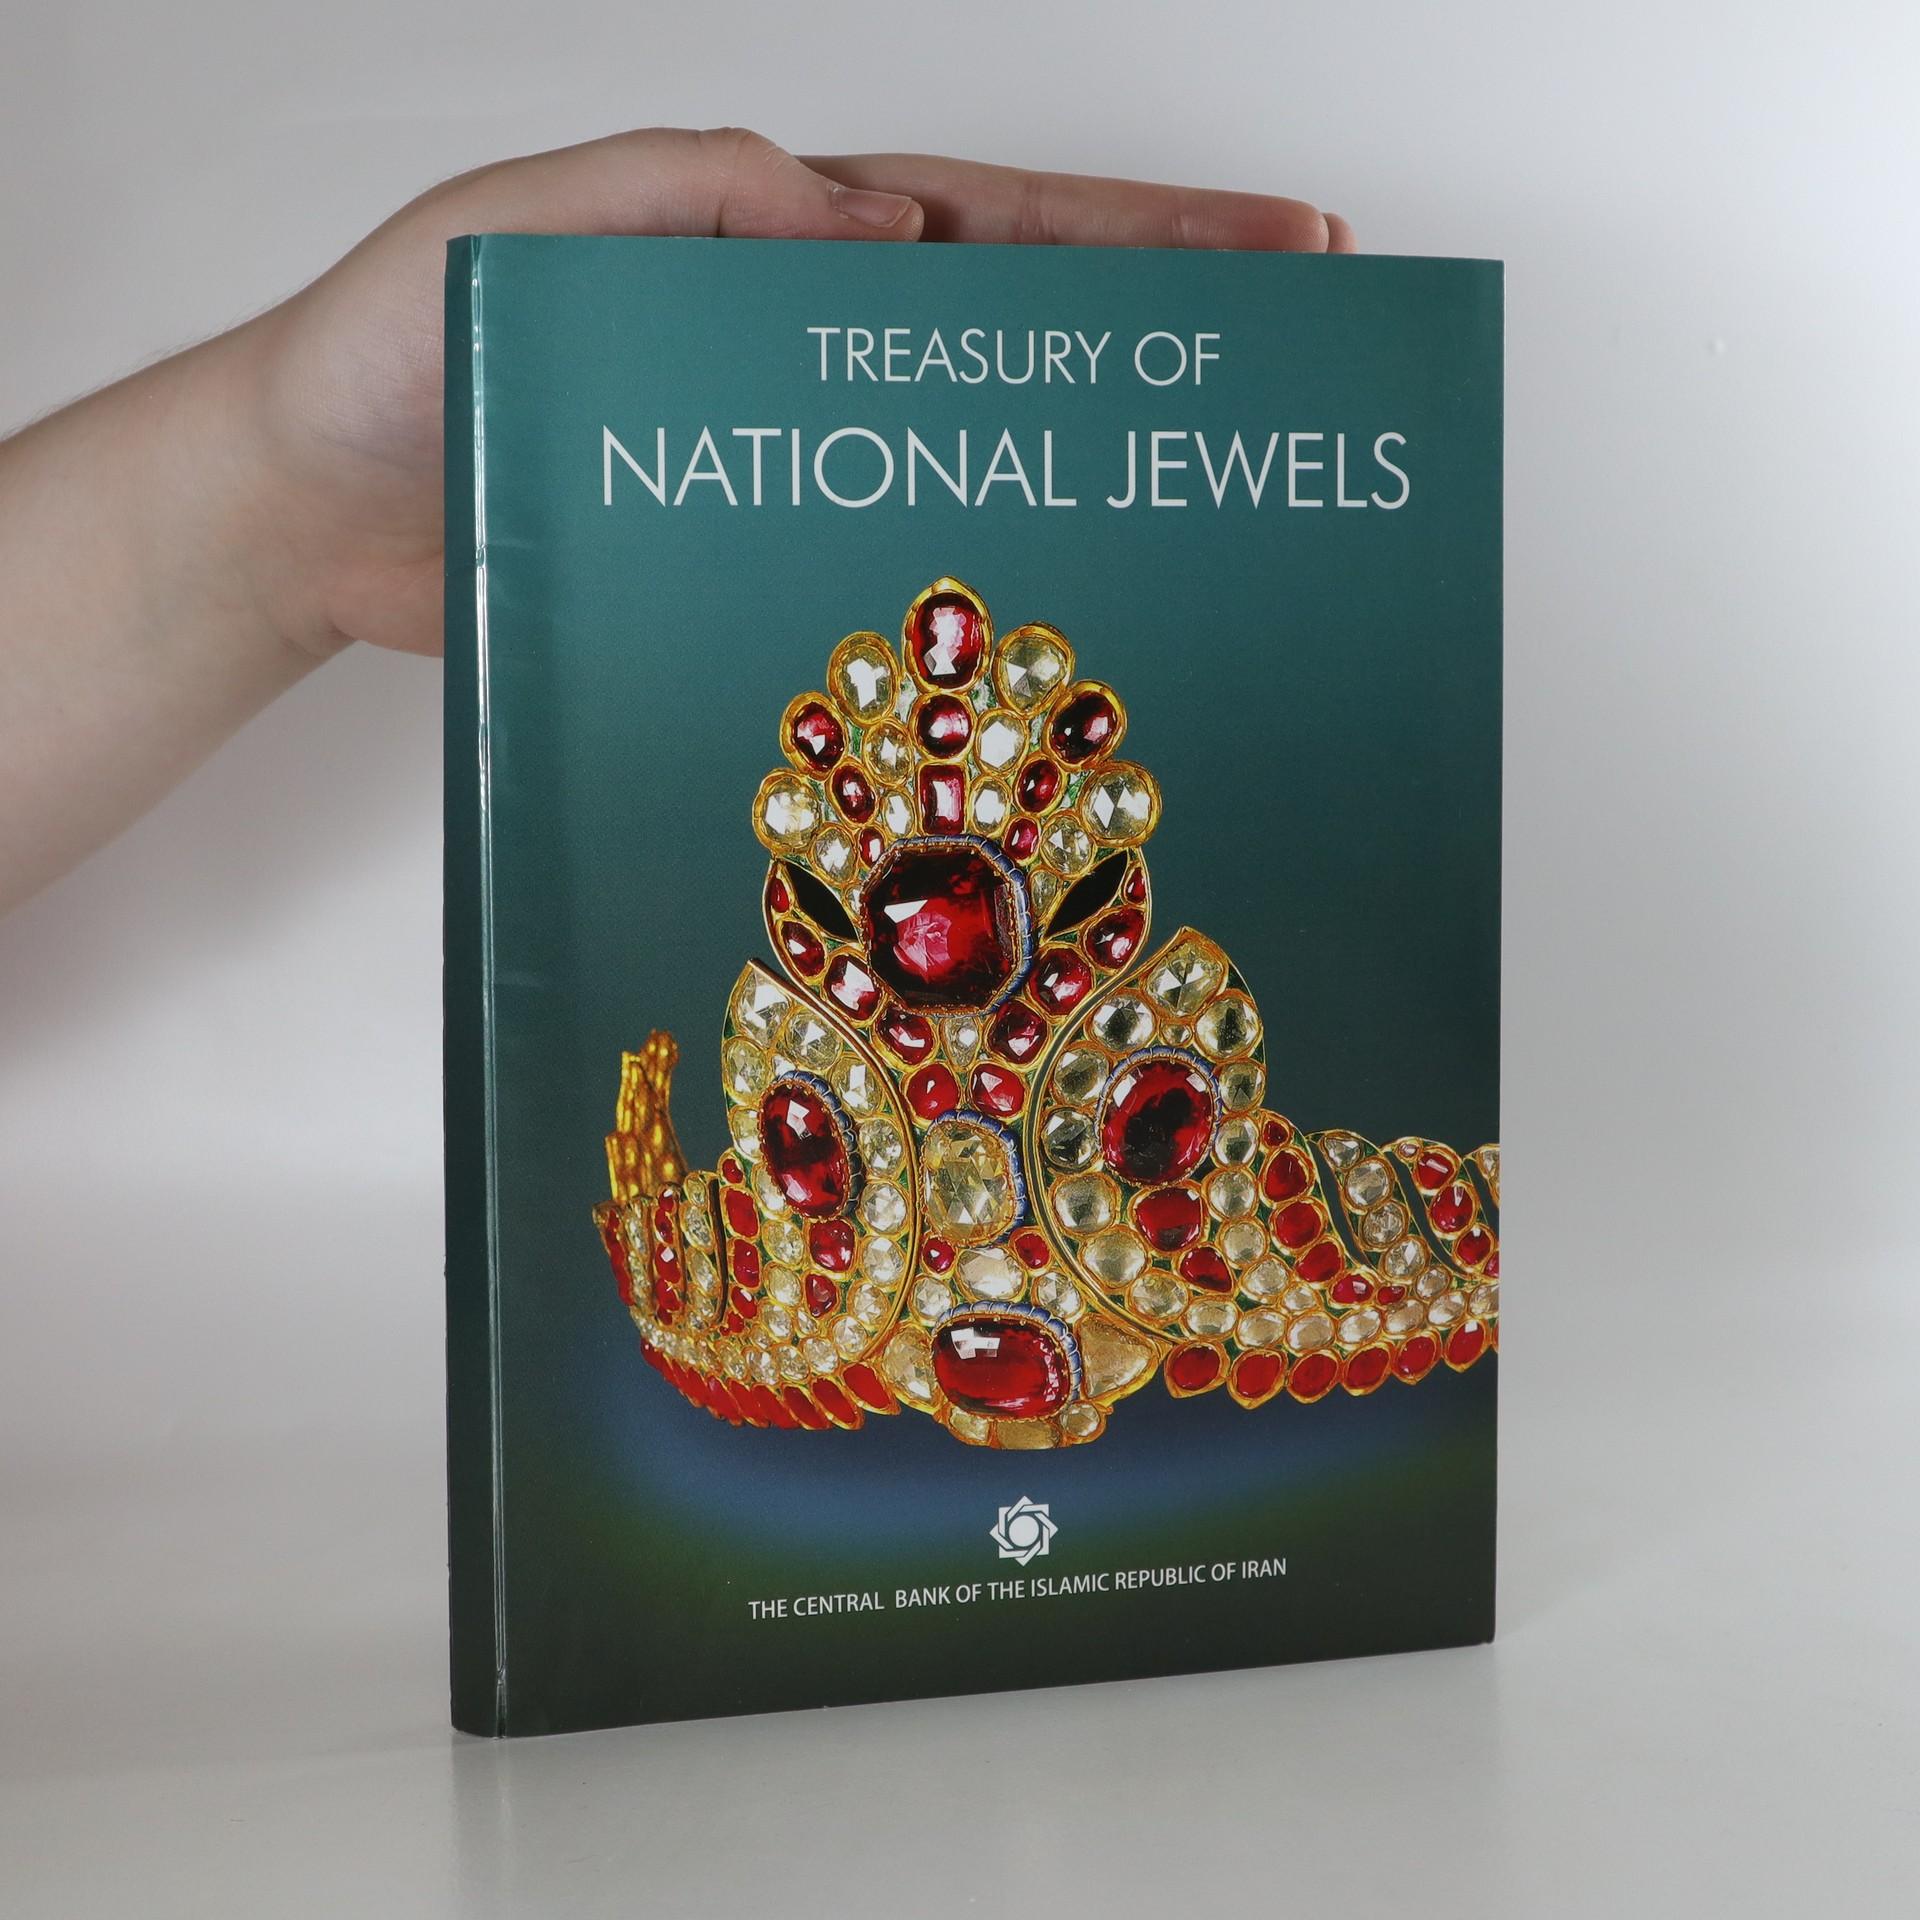 antikvární kniha Treasury of the national jewels, neuveden